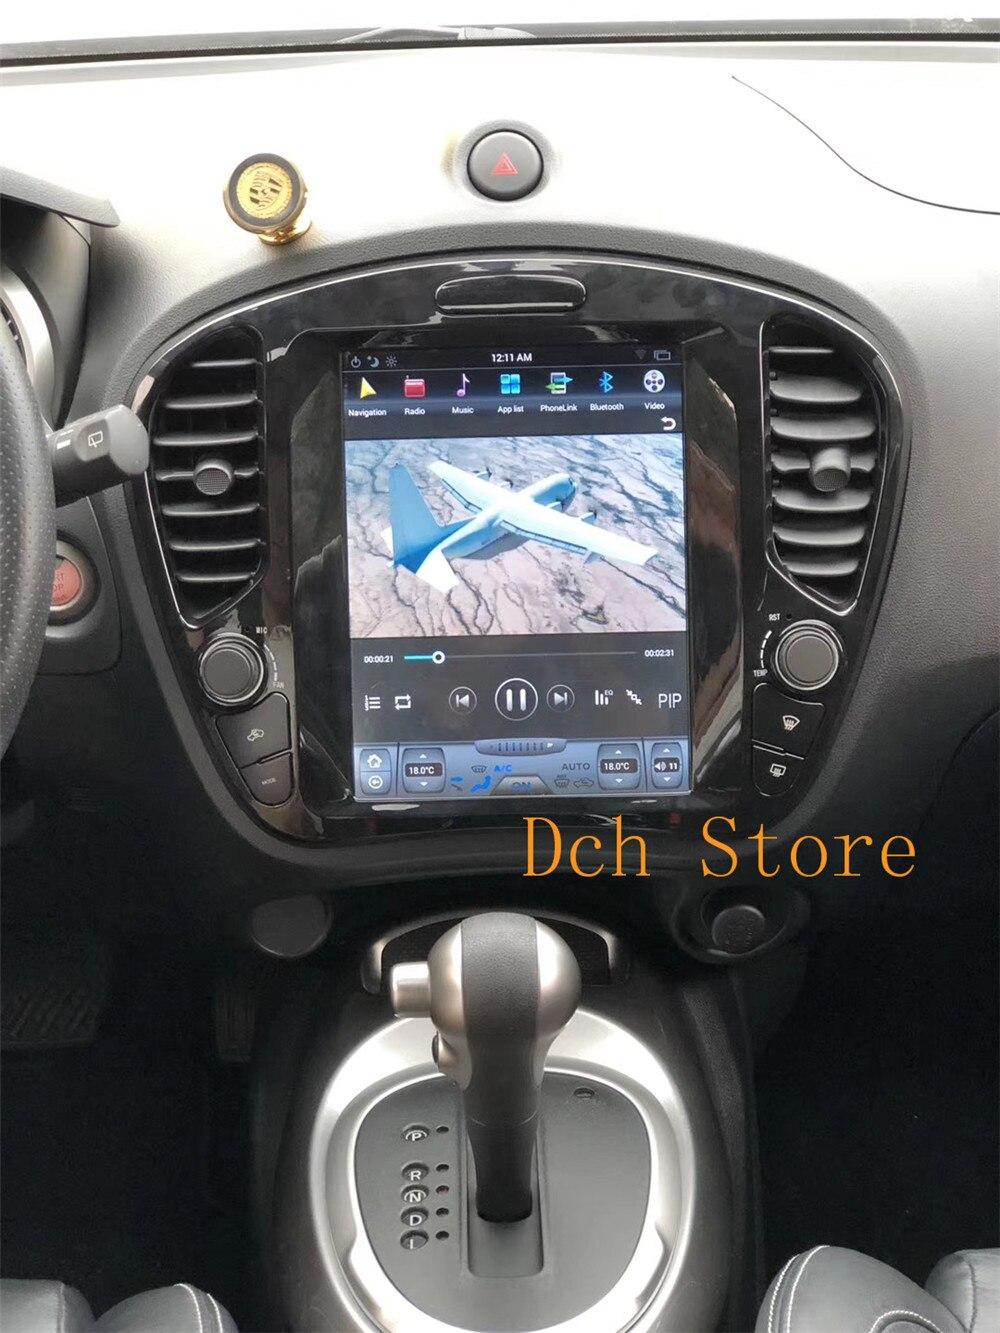 Autocardvdgps us $528.36 16% off|10.4'' tesla style android 8.1 auto car dvd gps player  for nissan juke infiniti esq 2014 2019 radio stereo headunits px6 navi-in